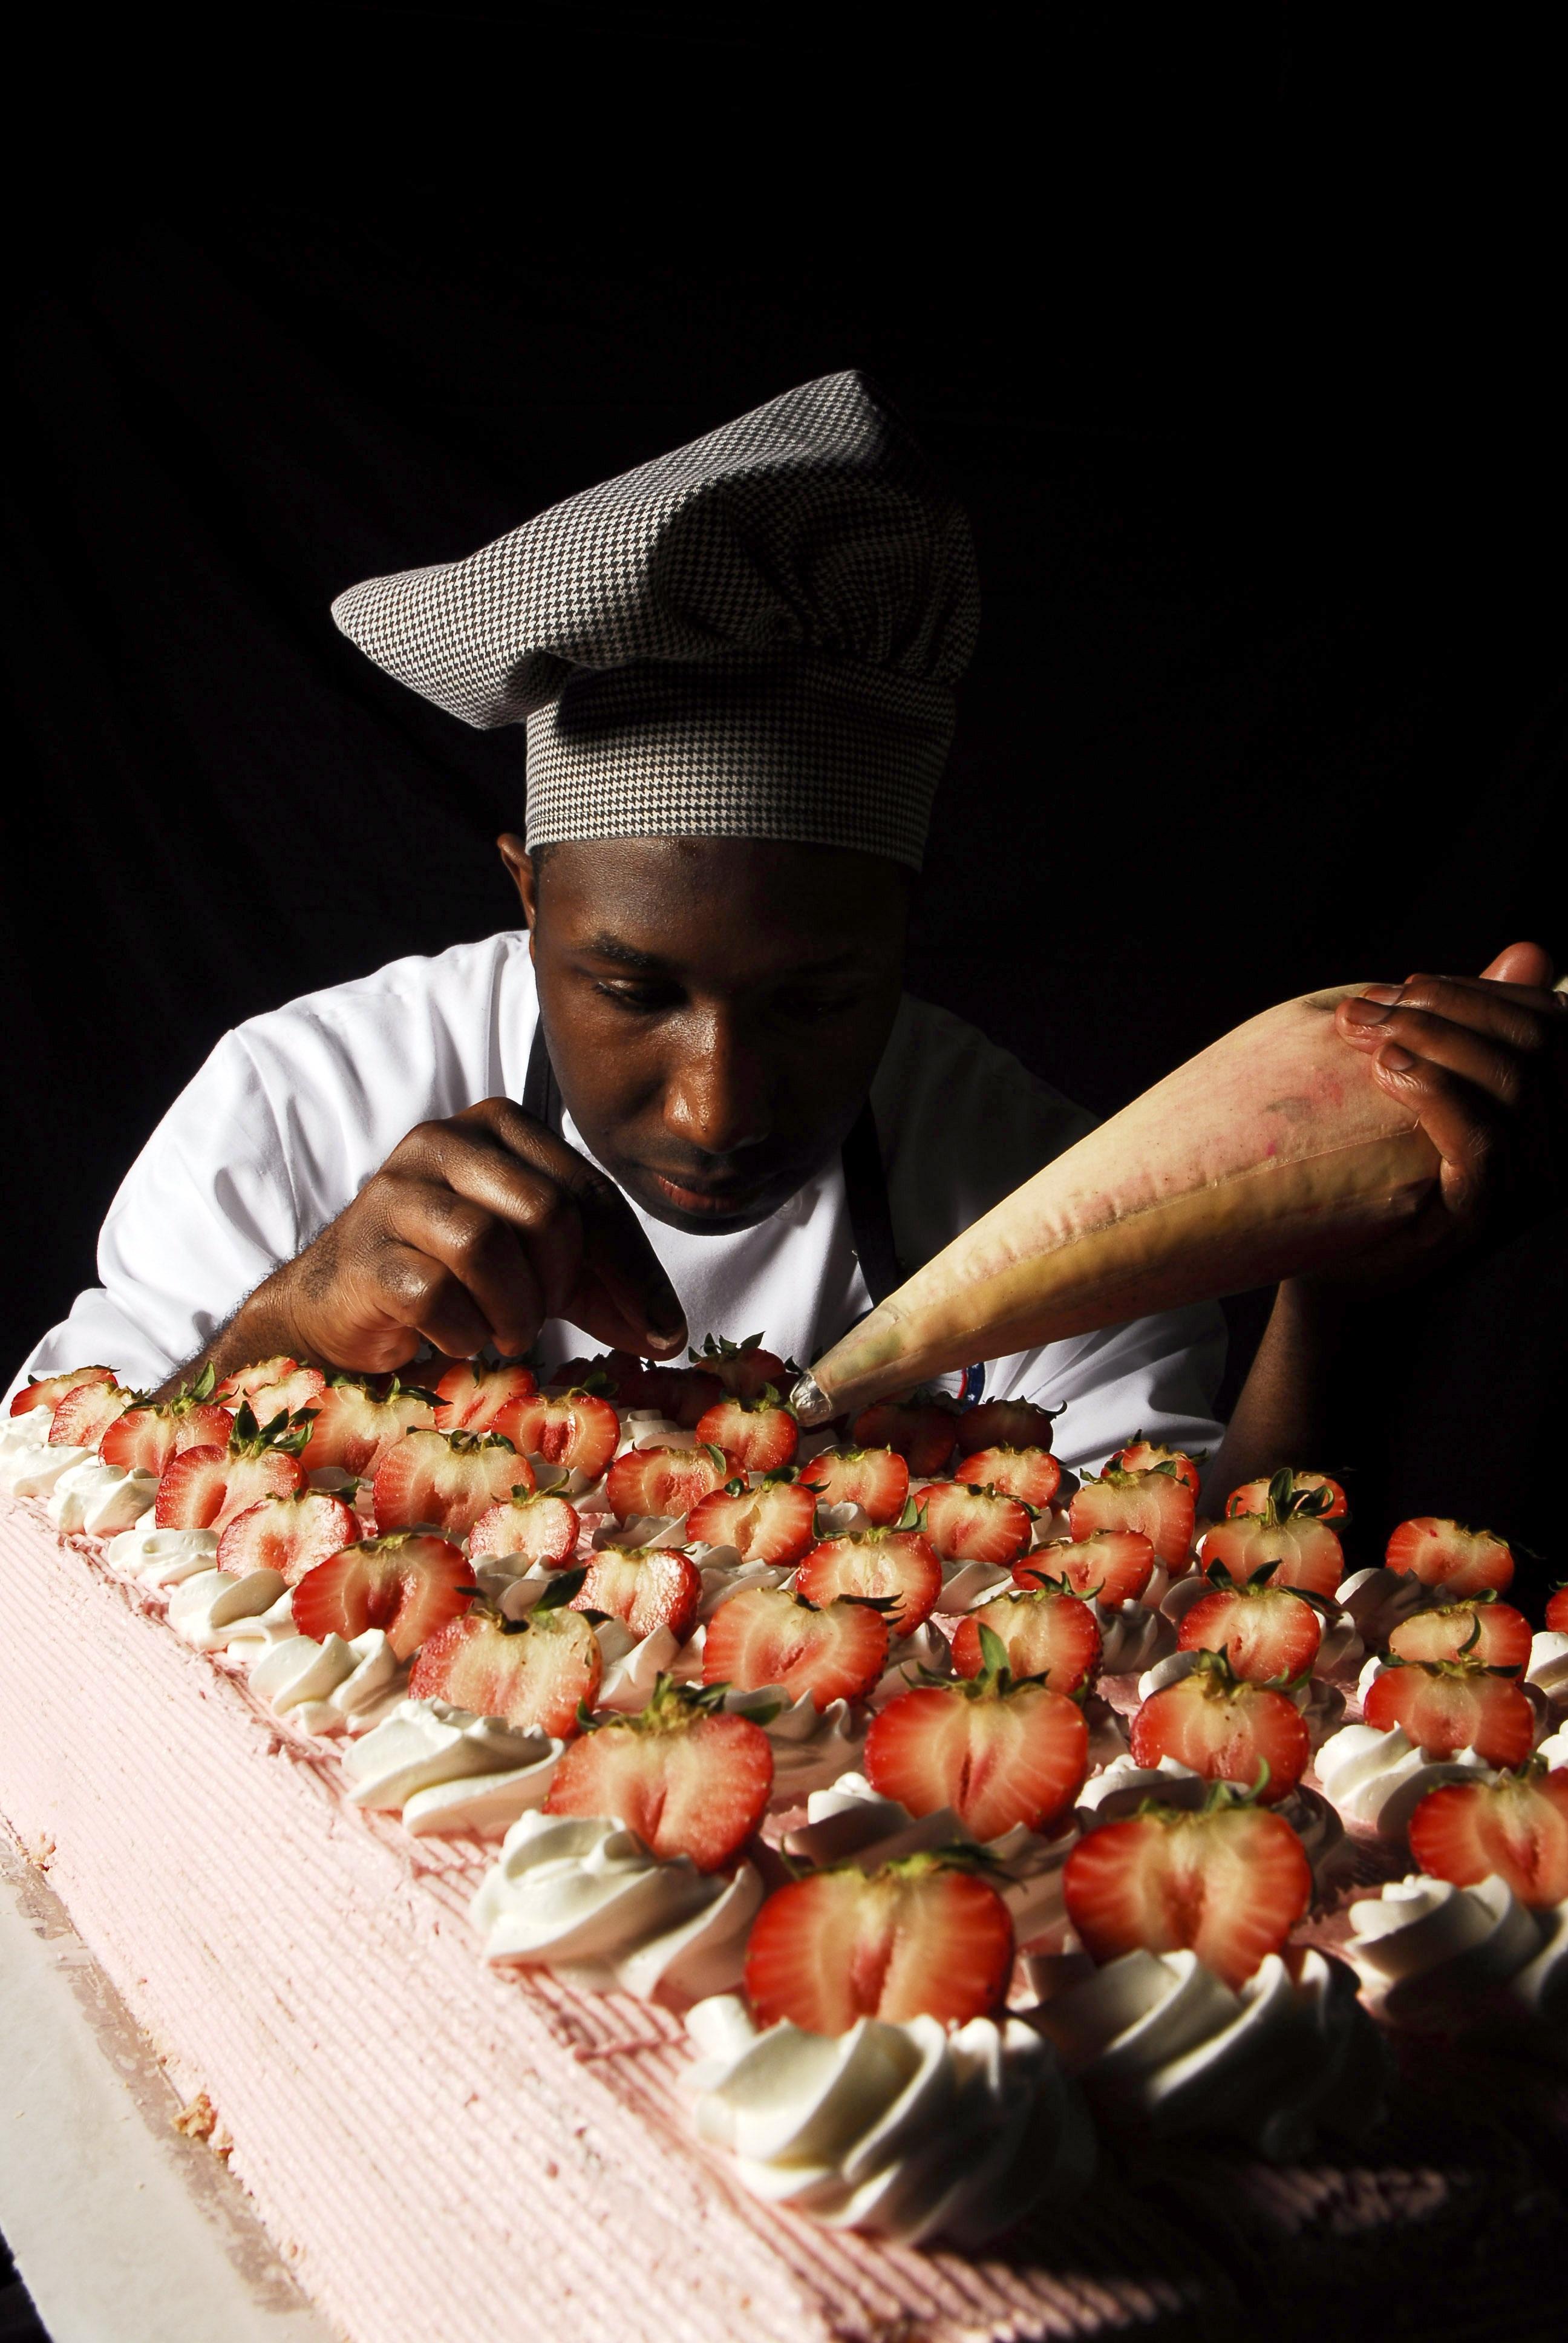 Strawberry Cake, Activity, Cake, Chef, Food, HQ Photo